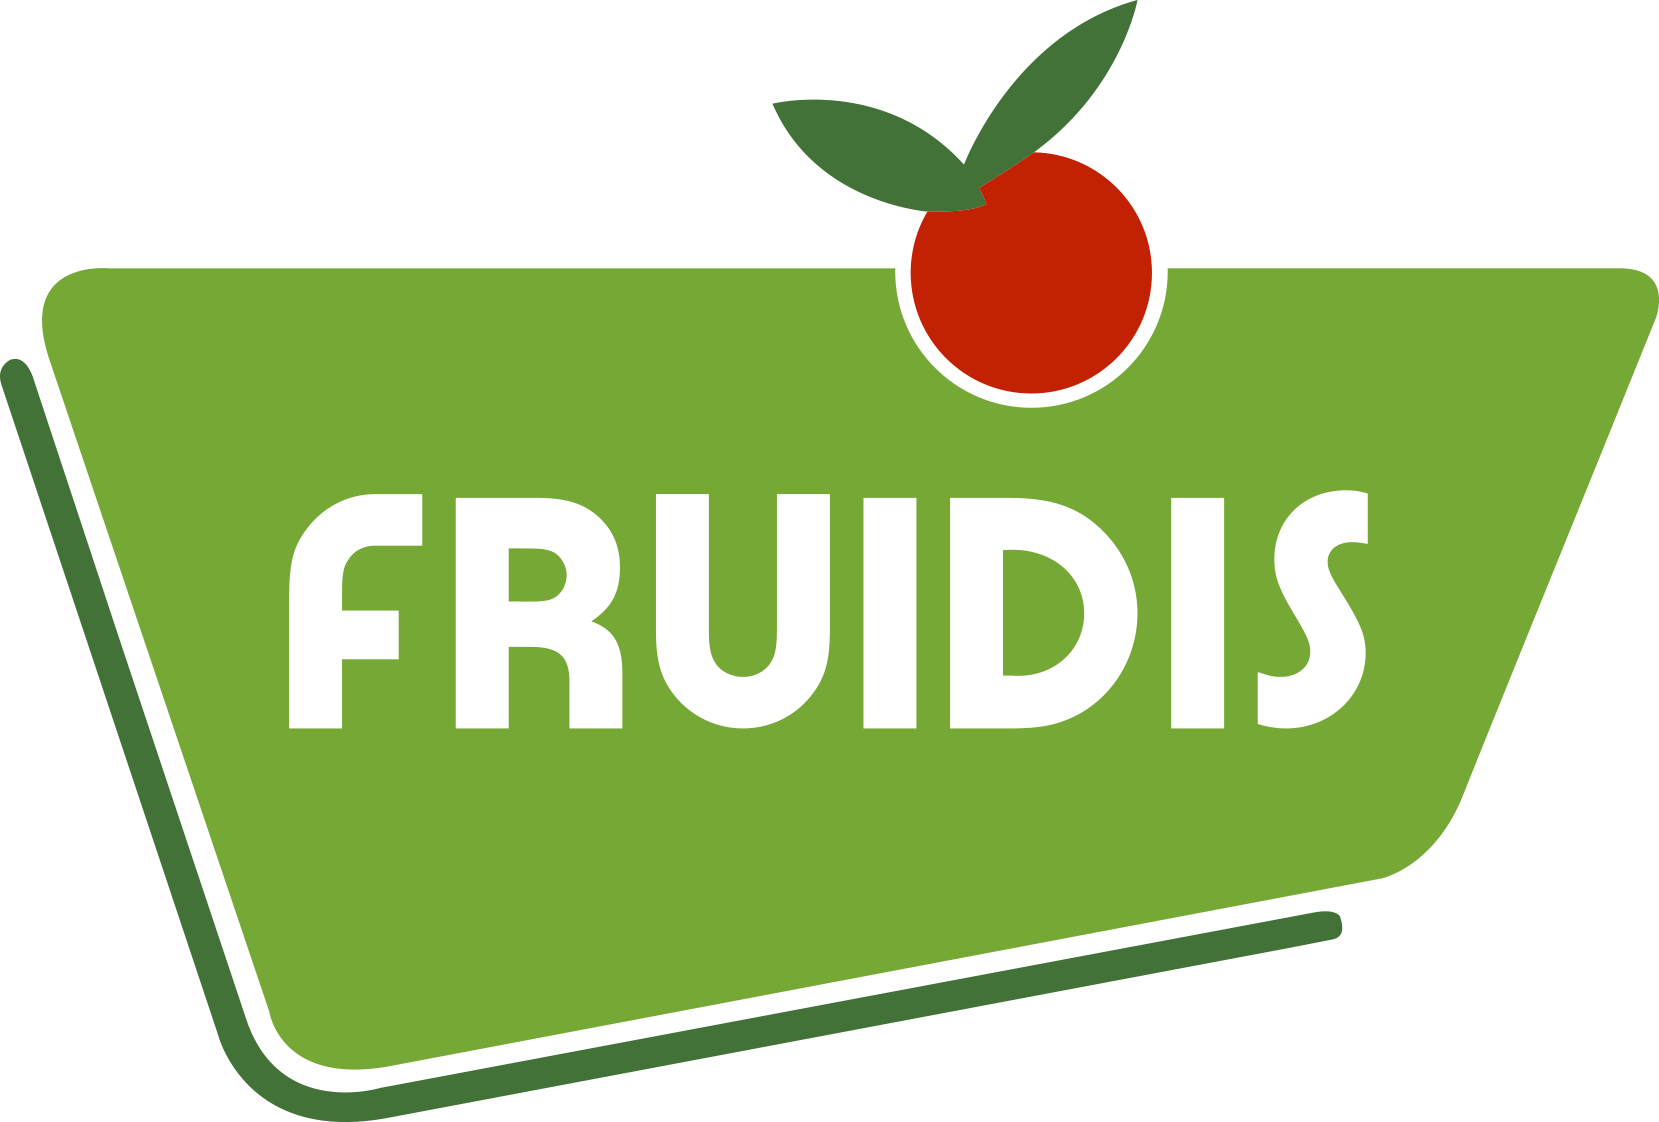 Fruidis_RVB